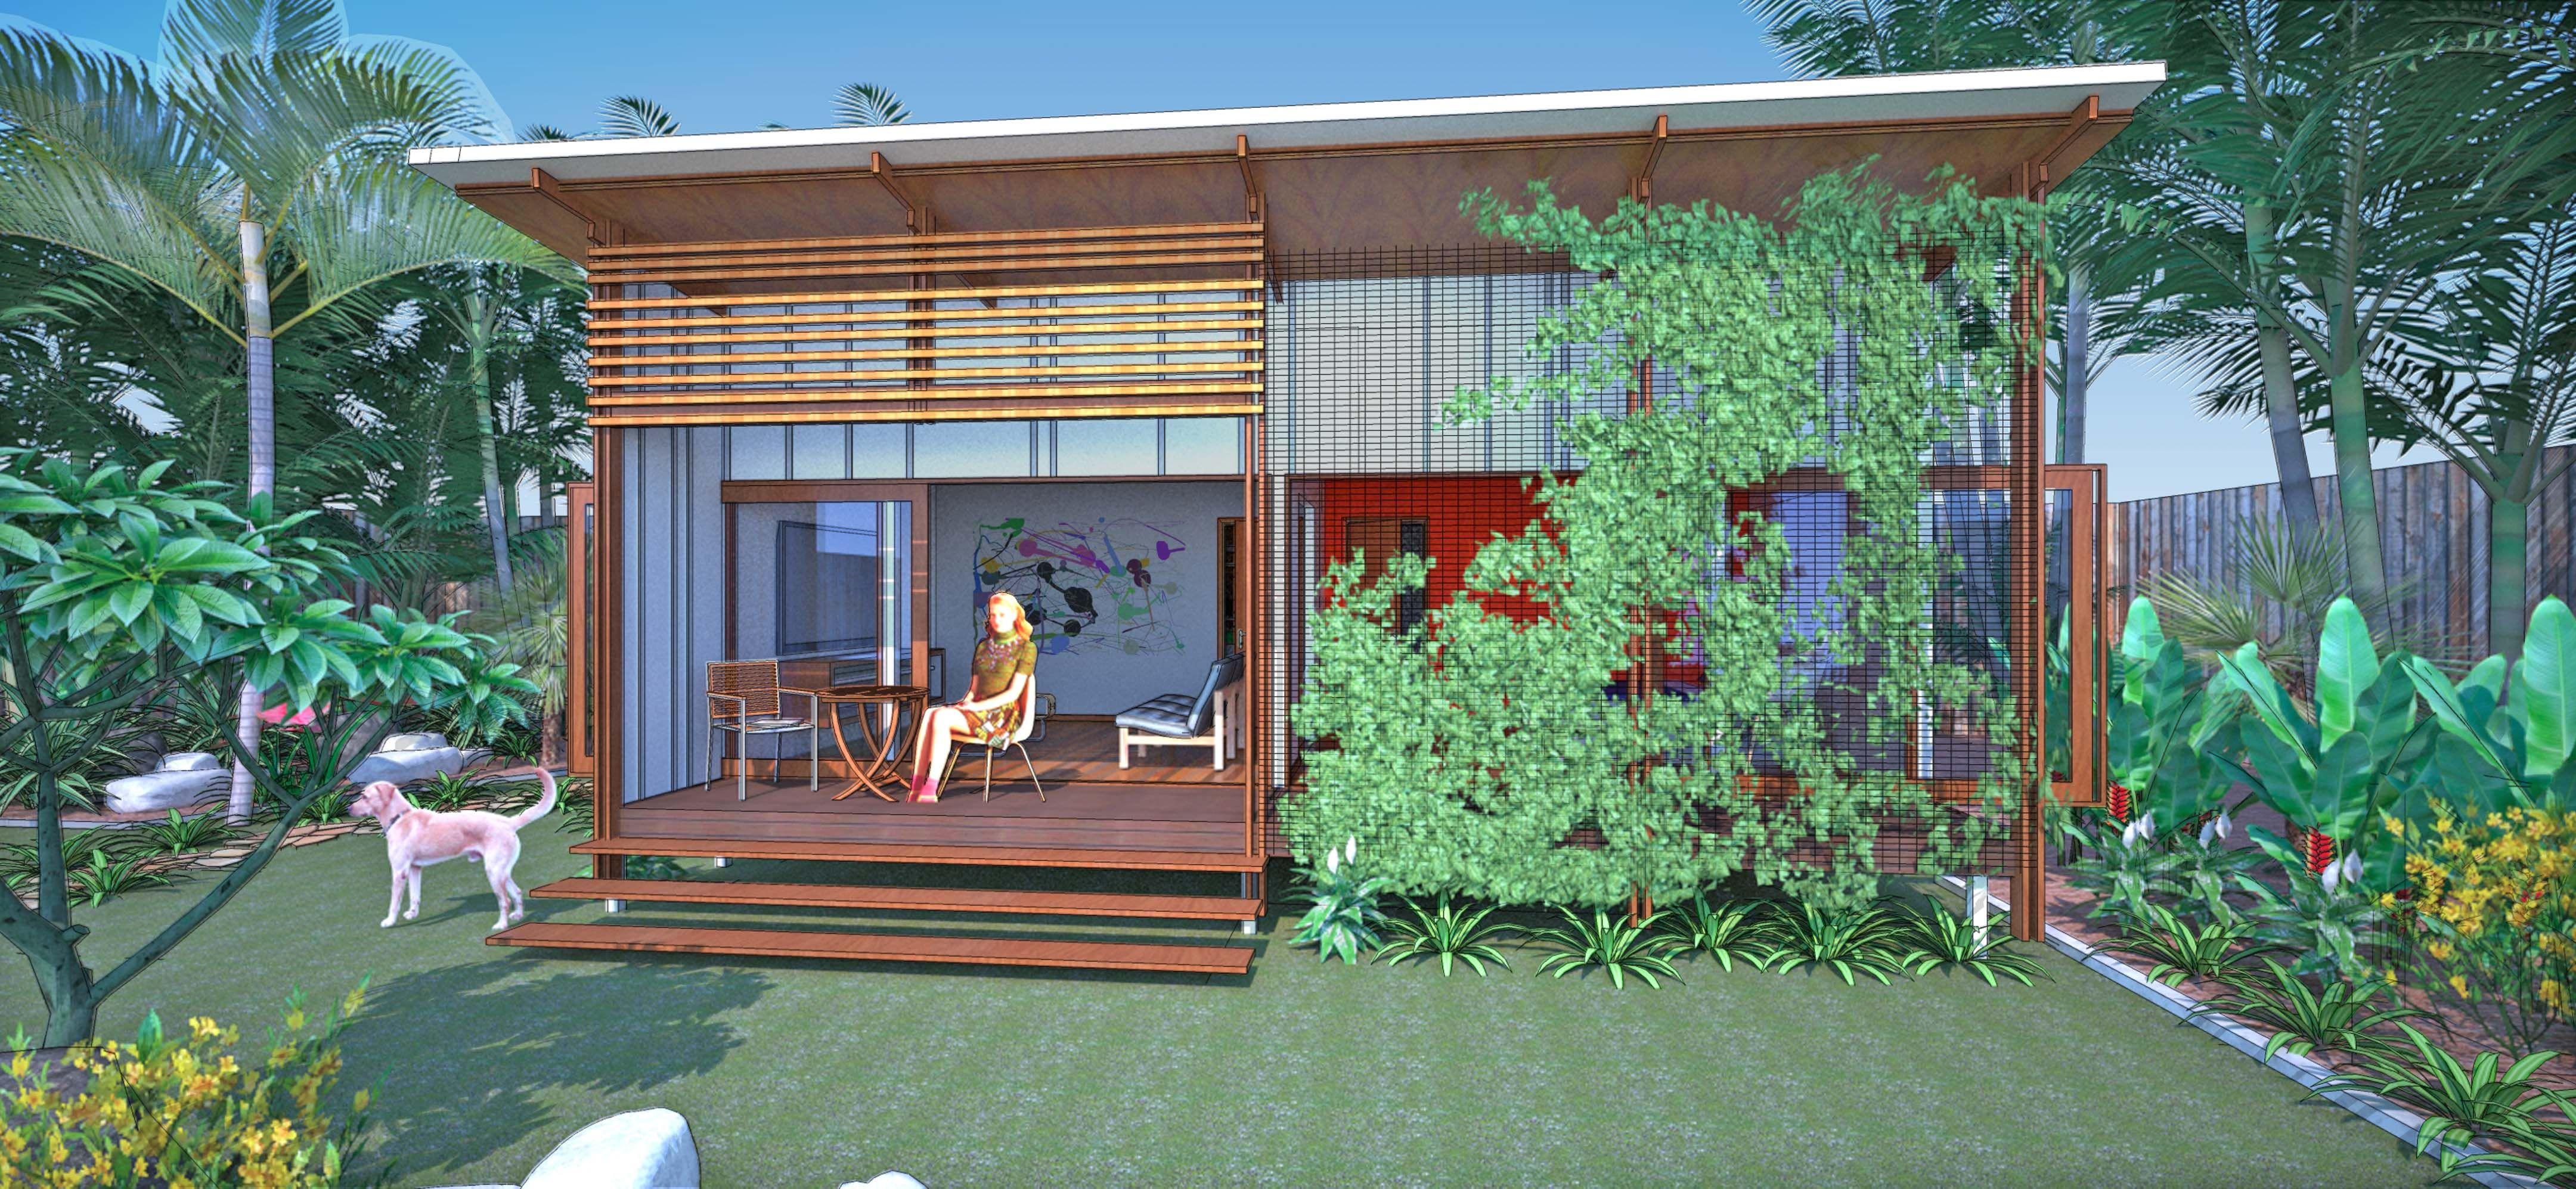 Coopworth 35sqm backyard retreat   Small house, Backyard ...